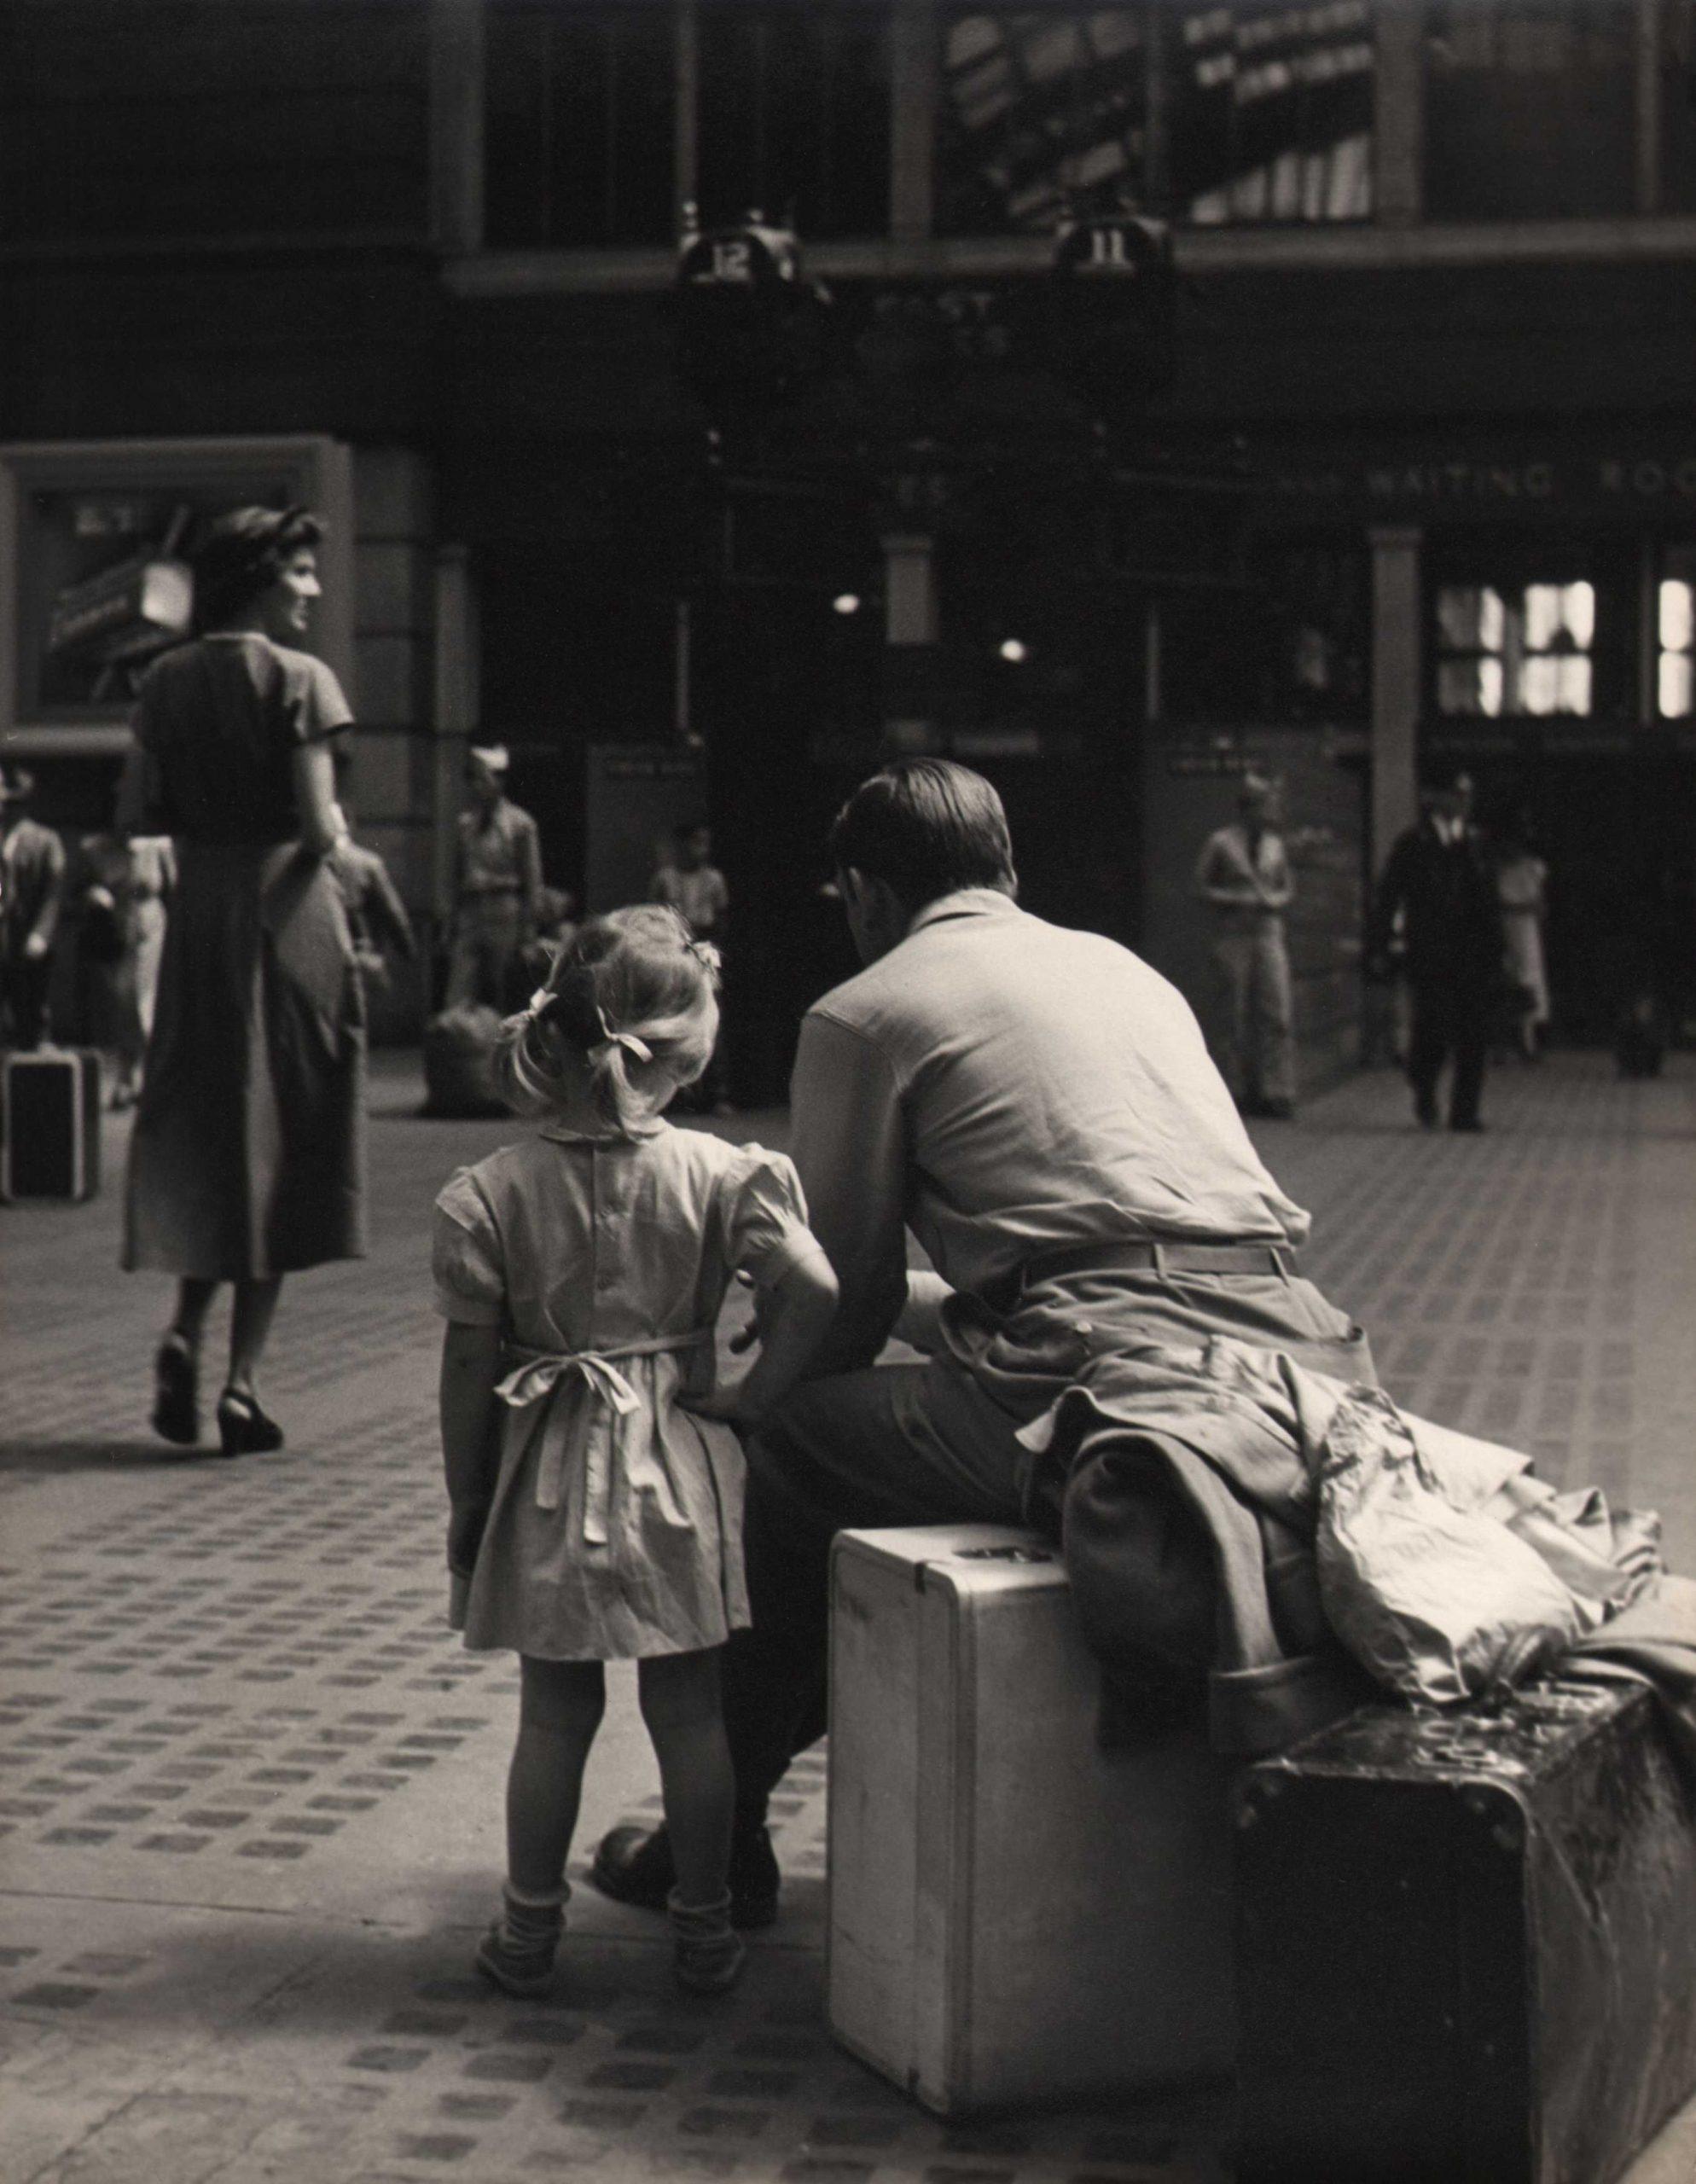 Simpson Kalisher, Untitled (Penn Station), c. 1949